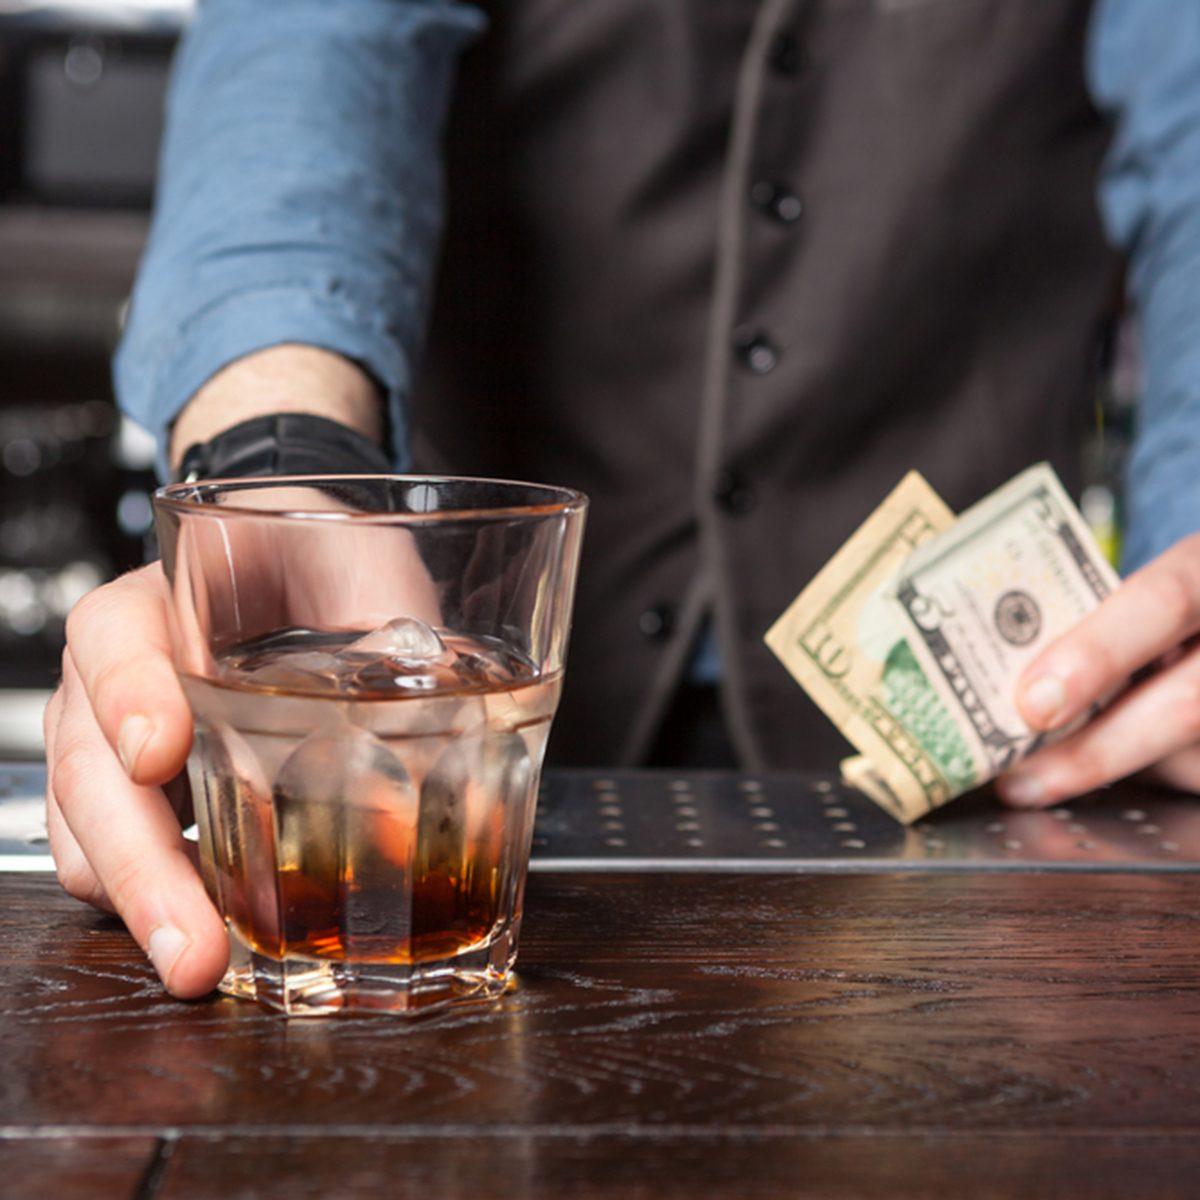 Barman giving whiskey glass with booze - closeup.; Shutterstock ID 409465387; Job (TFH, TOH, RD, BNB, CWM, CM): TOH